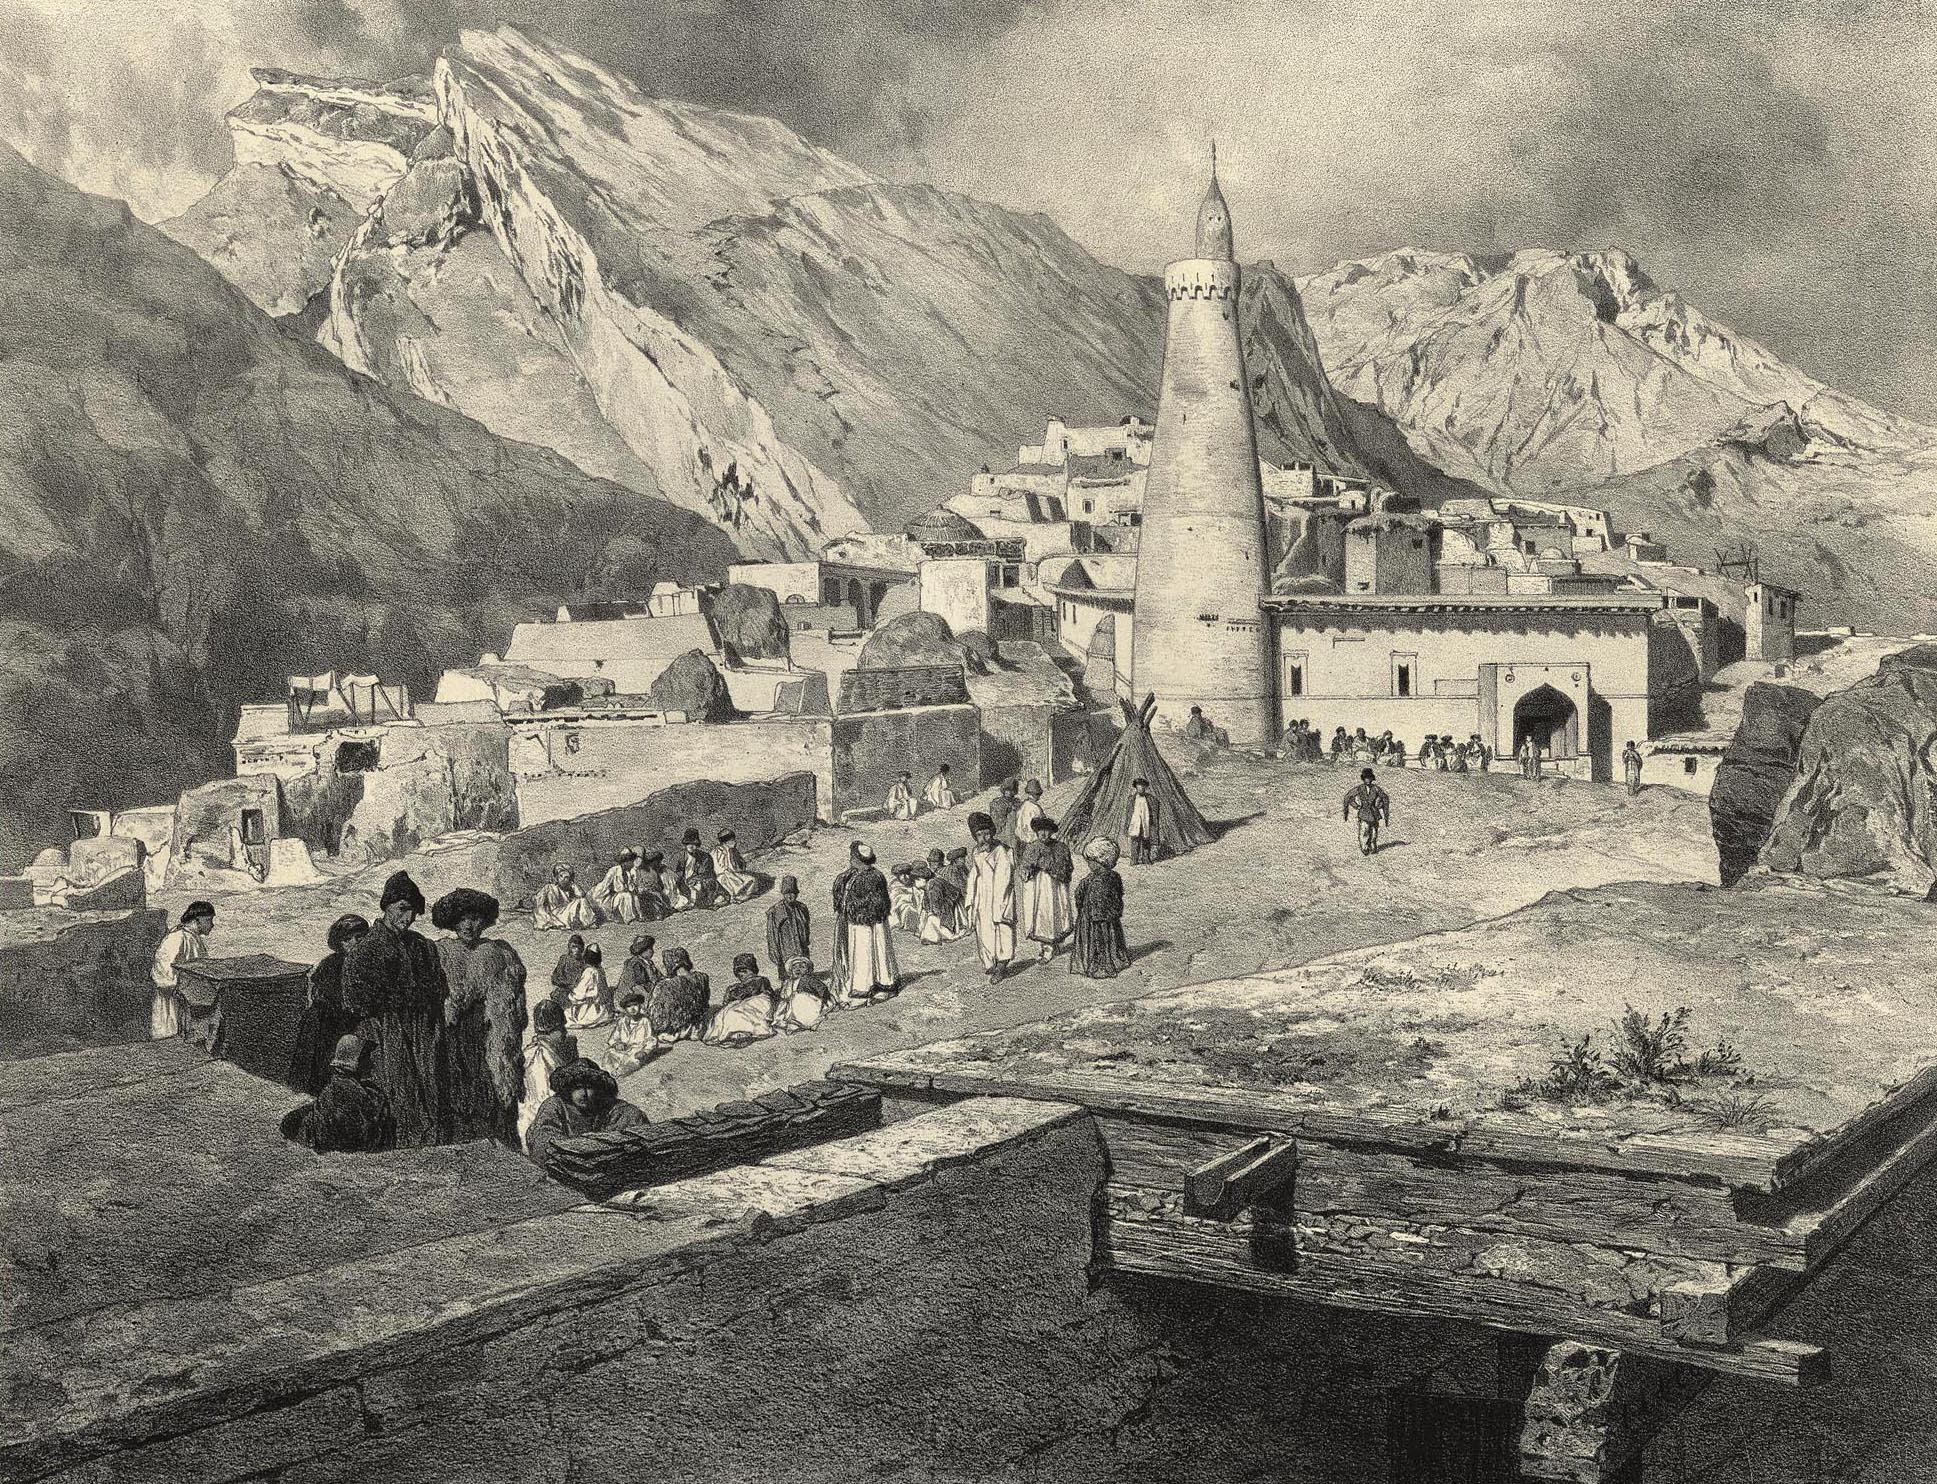 52. Daghestan central. Place de Tsoudakhar / Центральный Дагестан. Цудахар